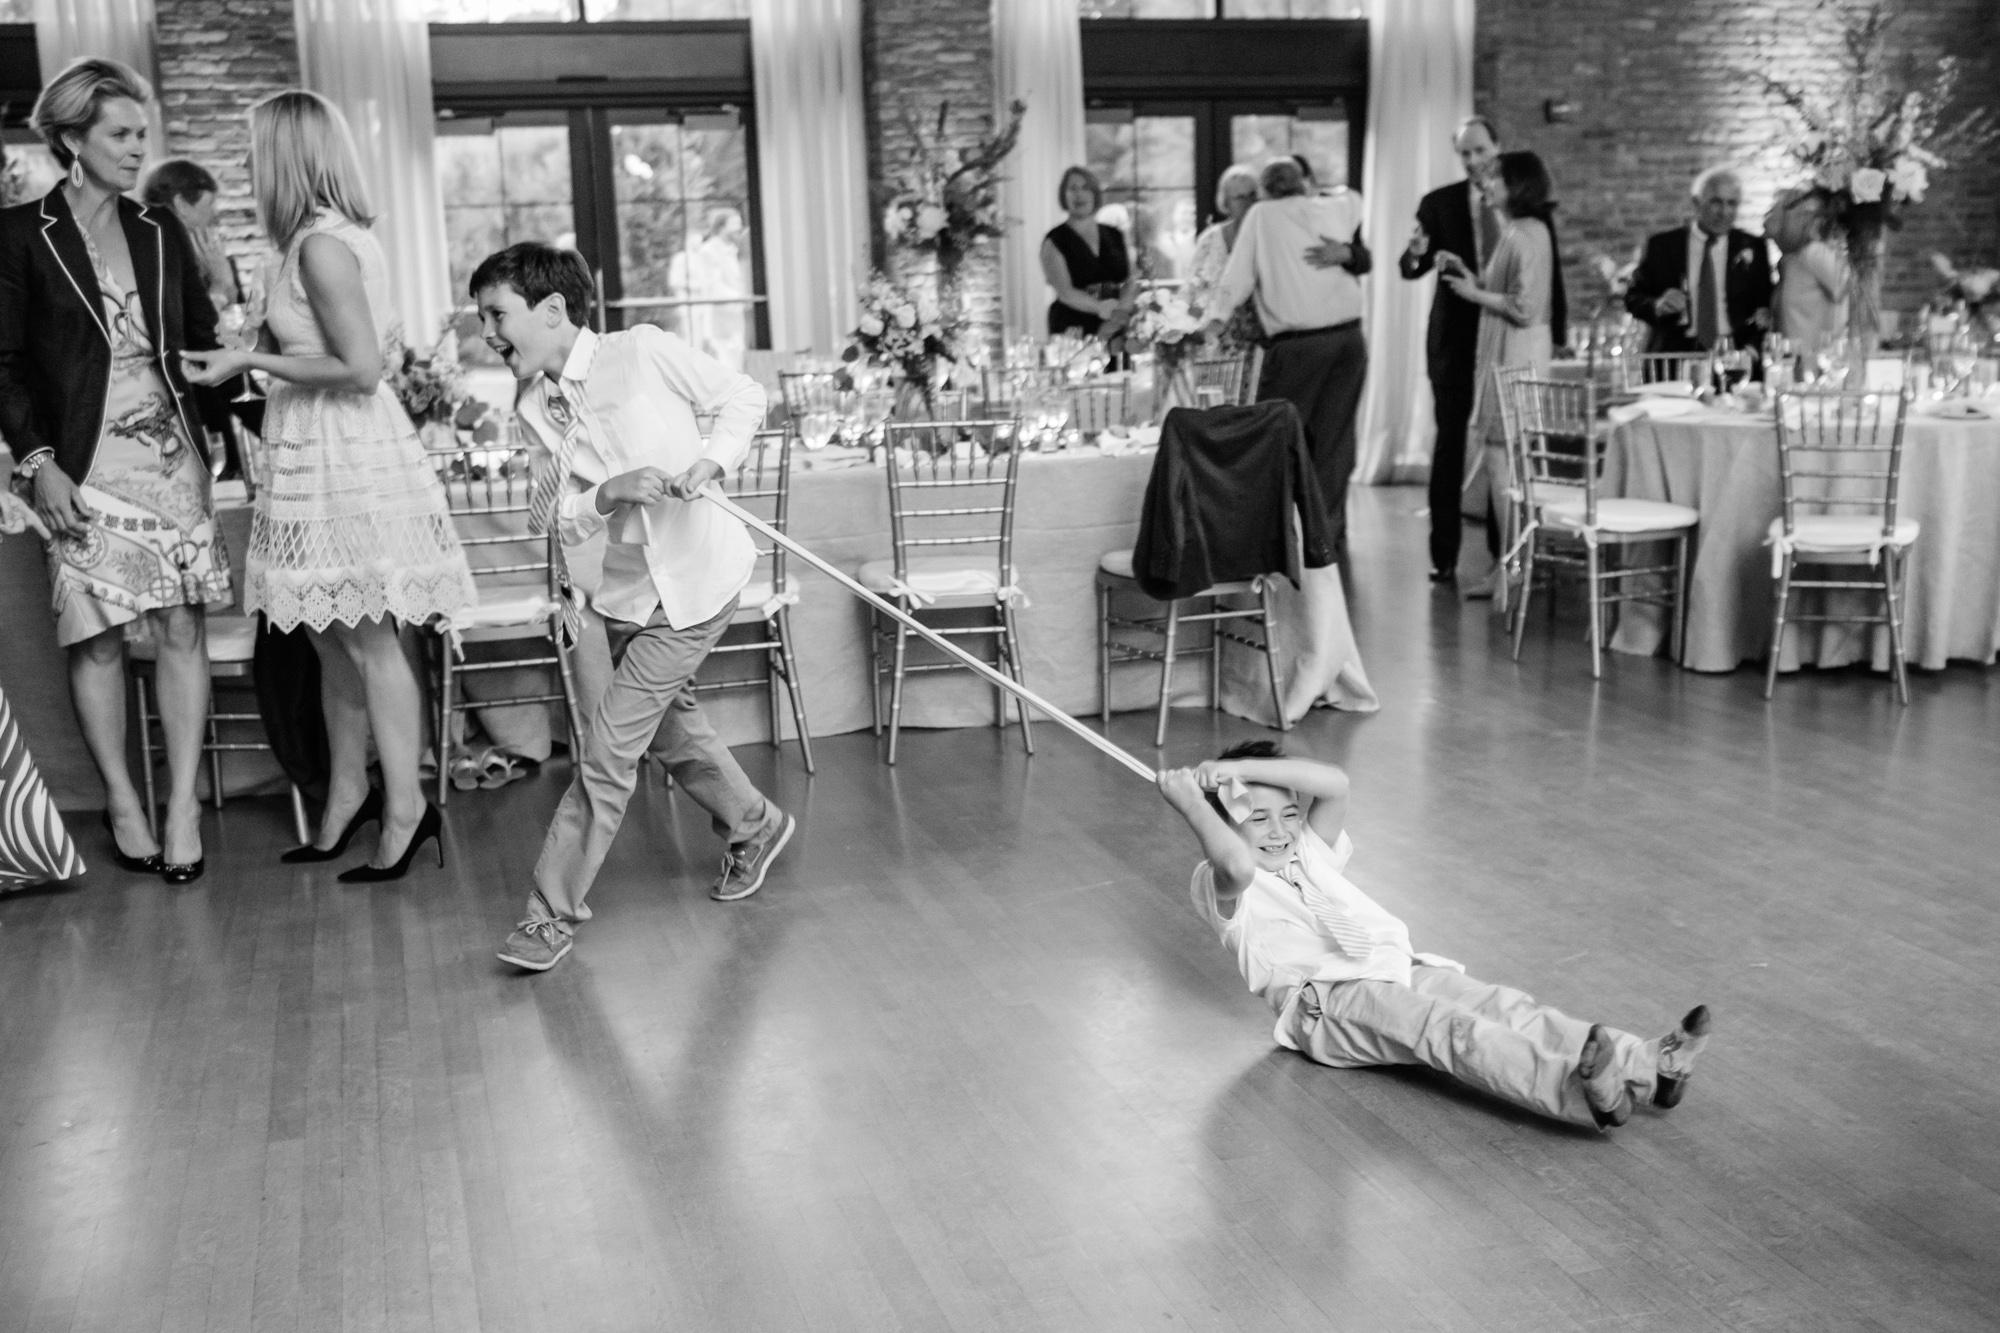 74_Rowan_Brian_The_Roundhouse_Wedding_Beacon_NY_Tanya_Salazar_Photography_824.jpg